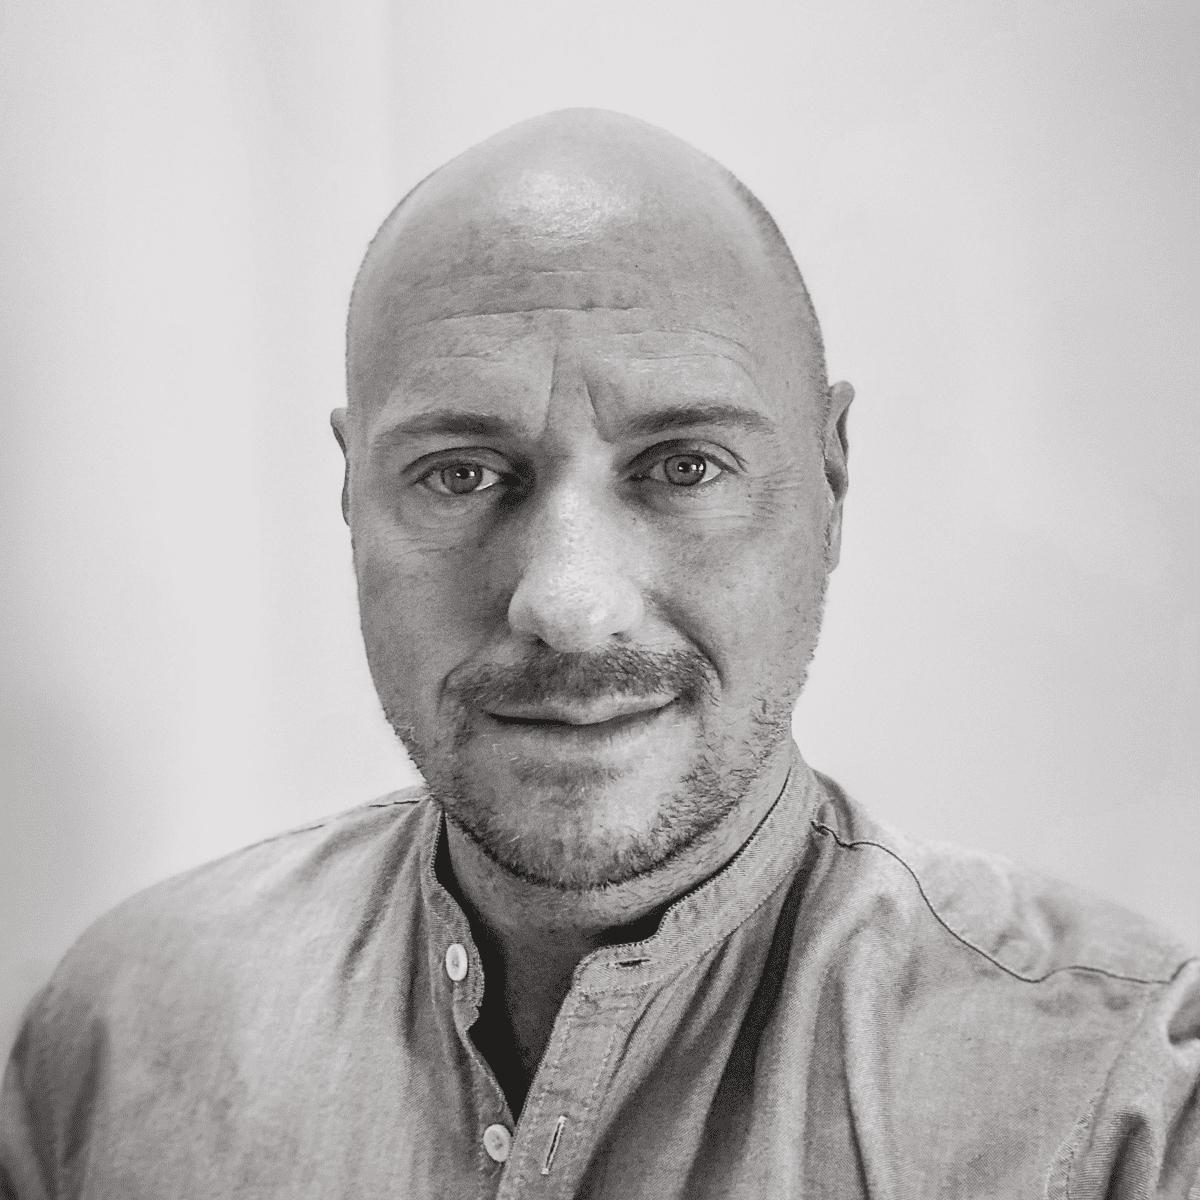 Andreas Bucksteeg